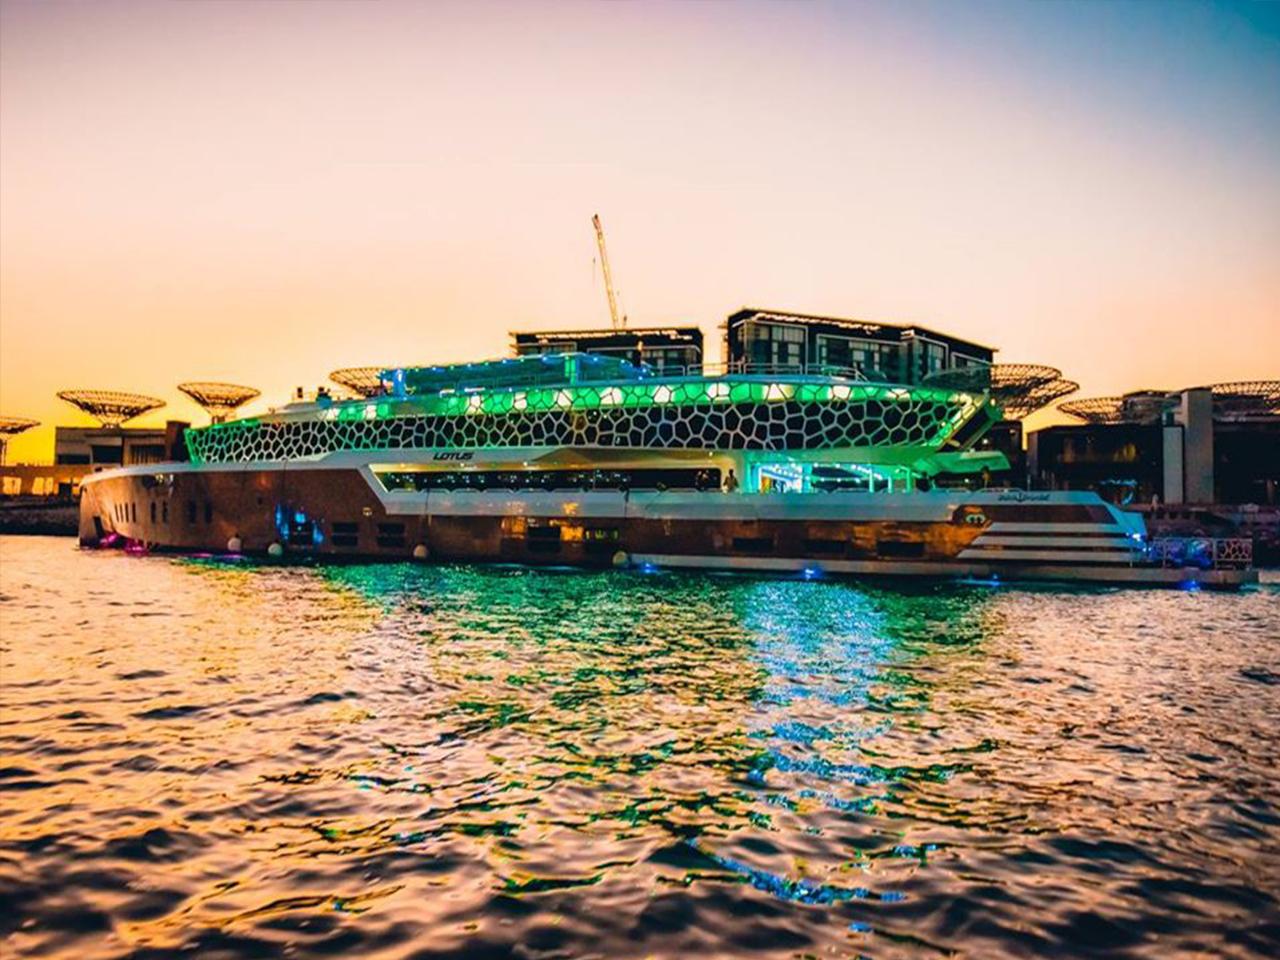 Lotus-Mega-Yacht-Cruise-Dinner-Dubai-Gallery-8